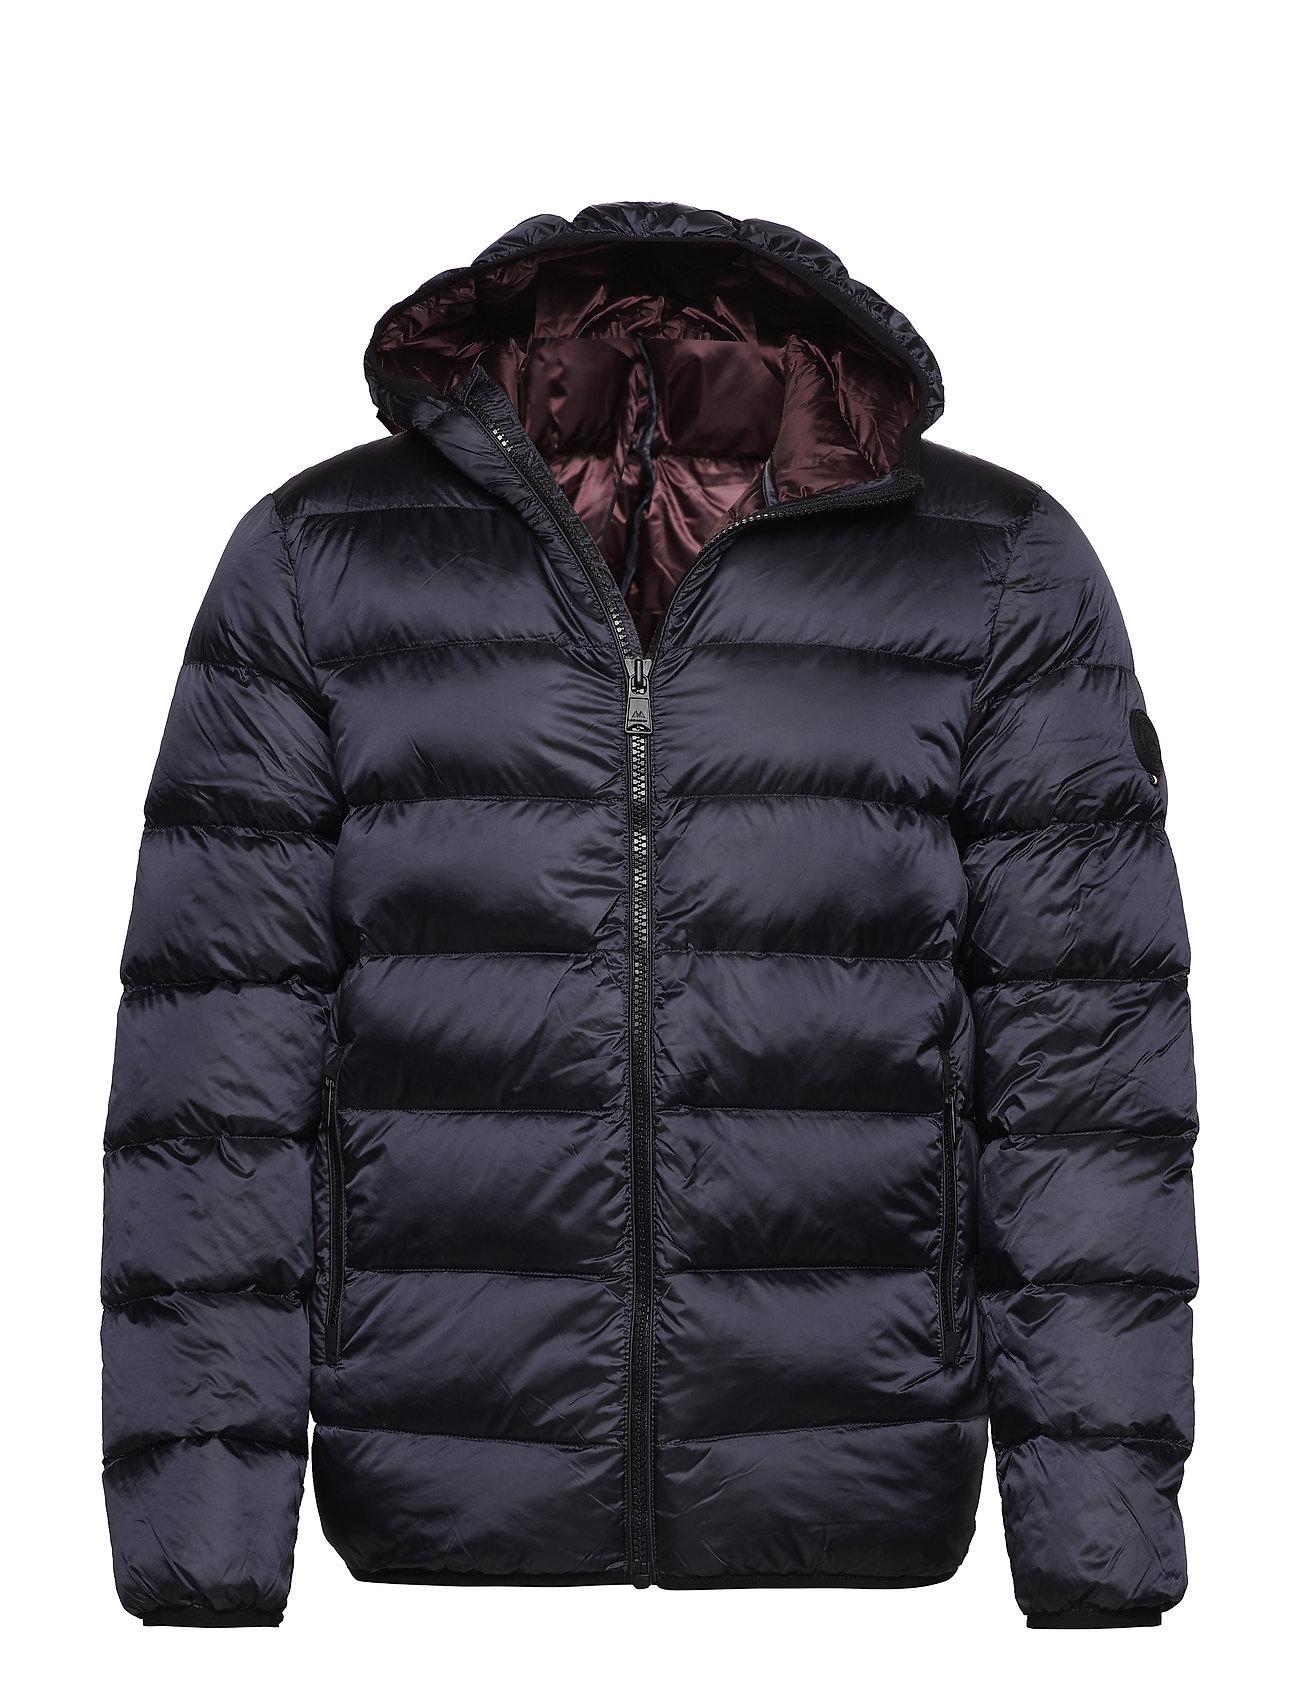 Lindbergh Down puffer jacket with hood